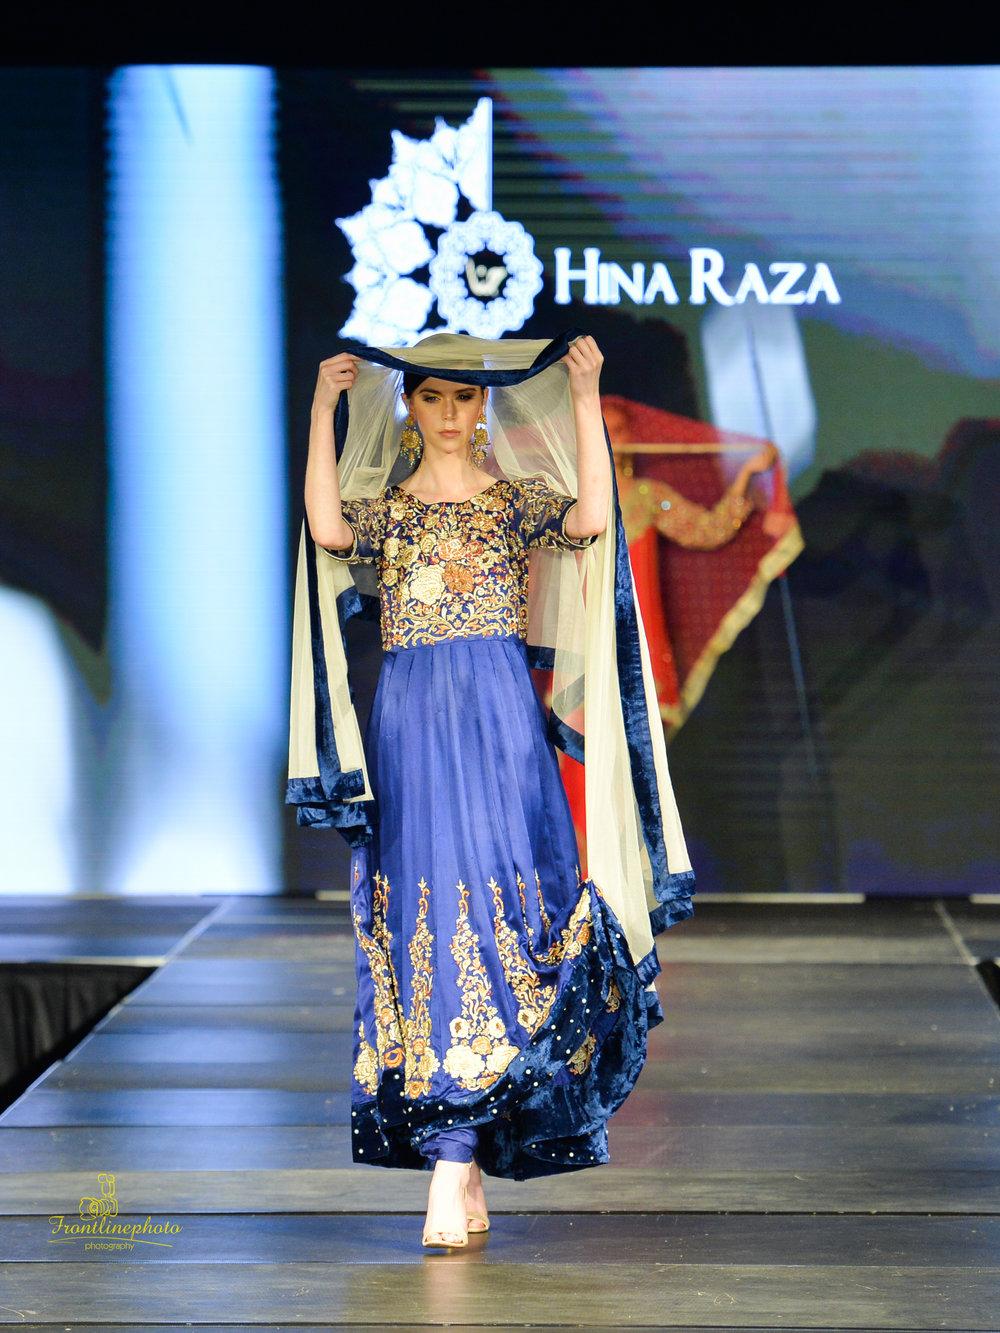 2018 IFFC Hina Raza-2.jpg